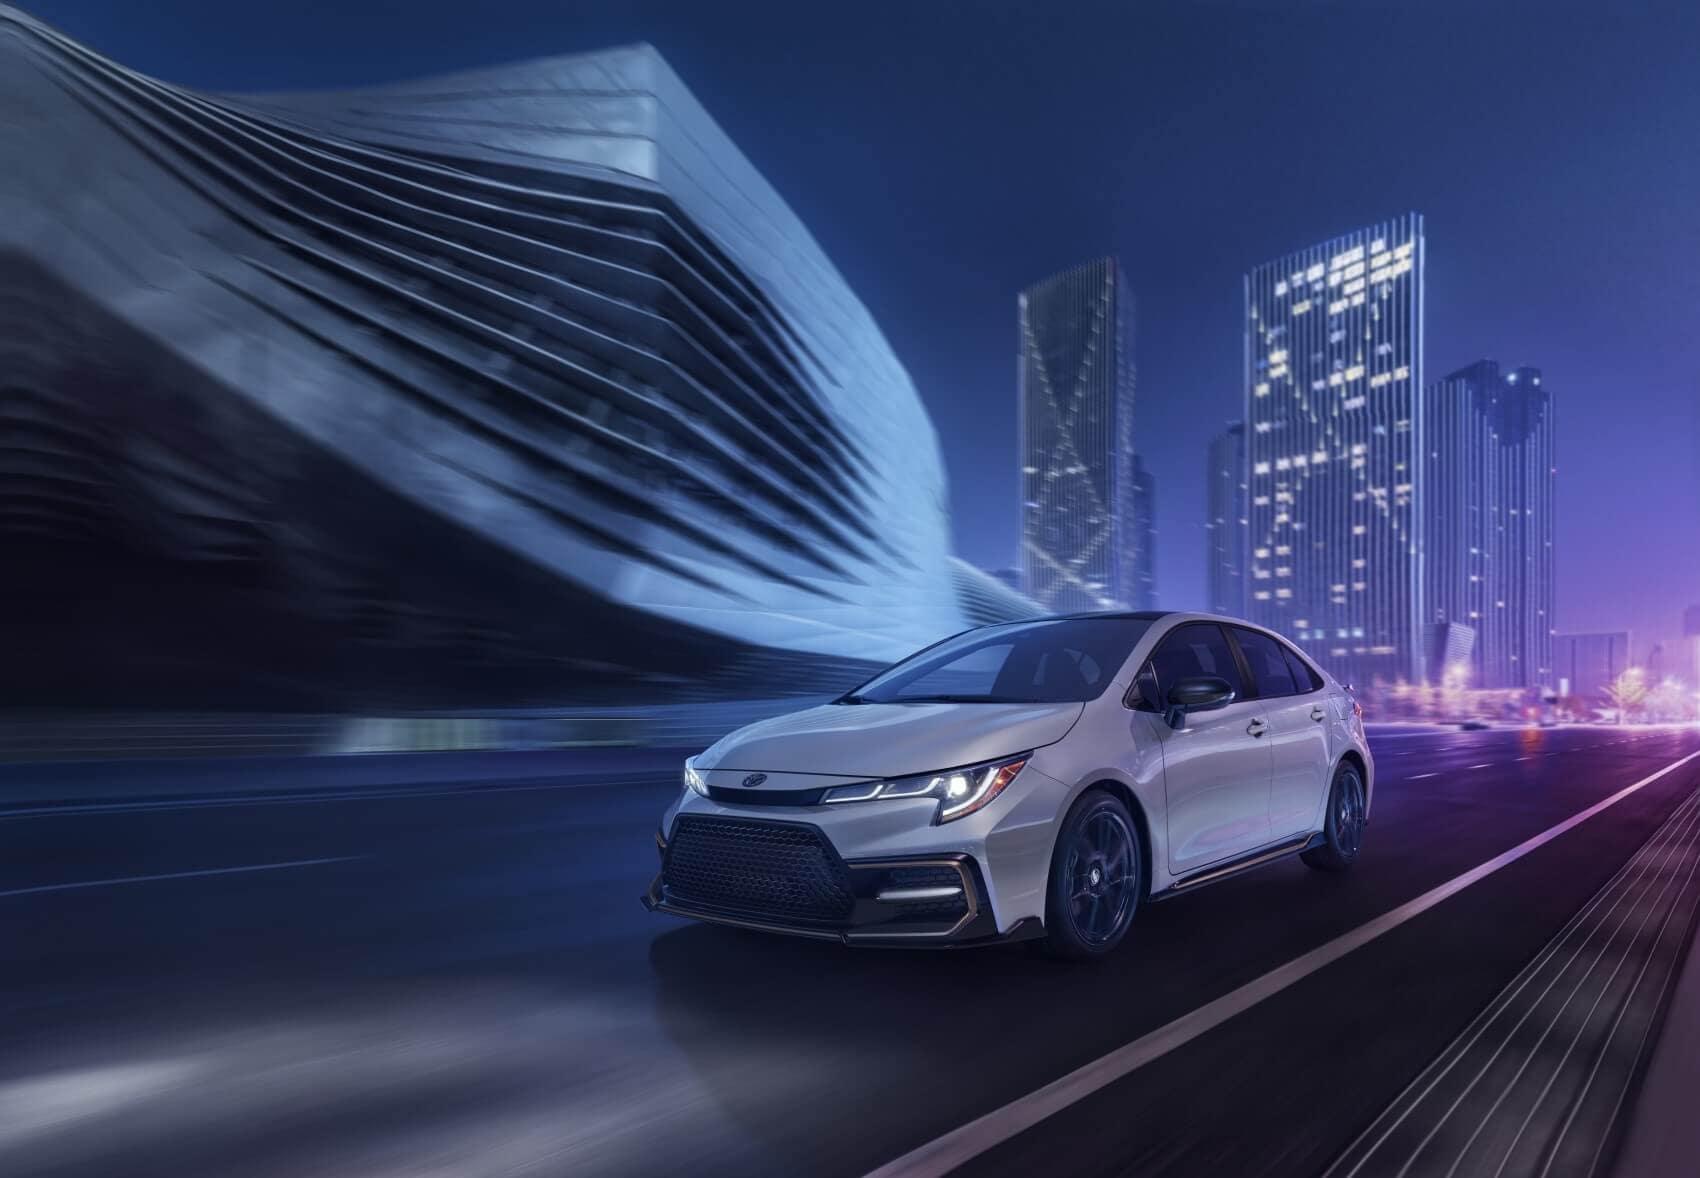 Toyota Corolla vs Hyundai Elantra